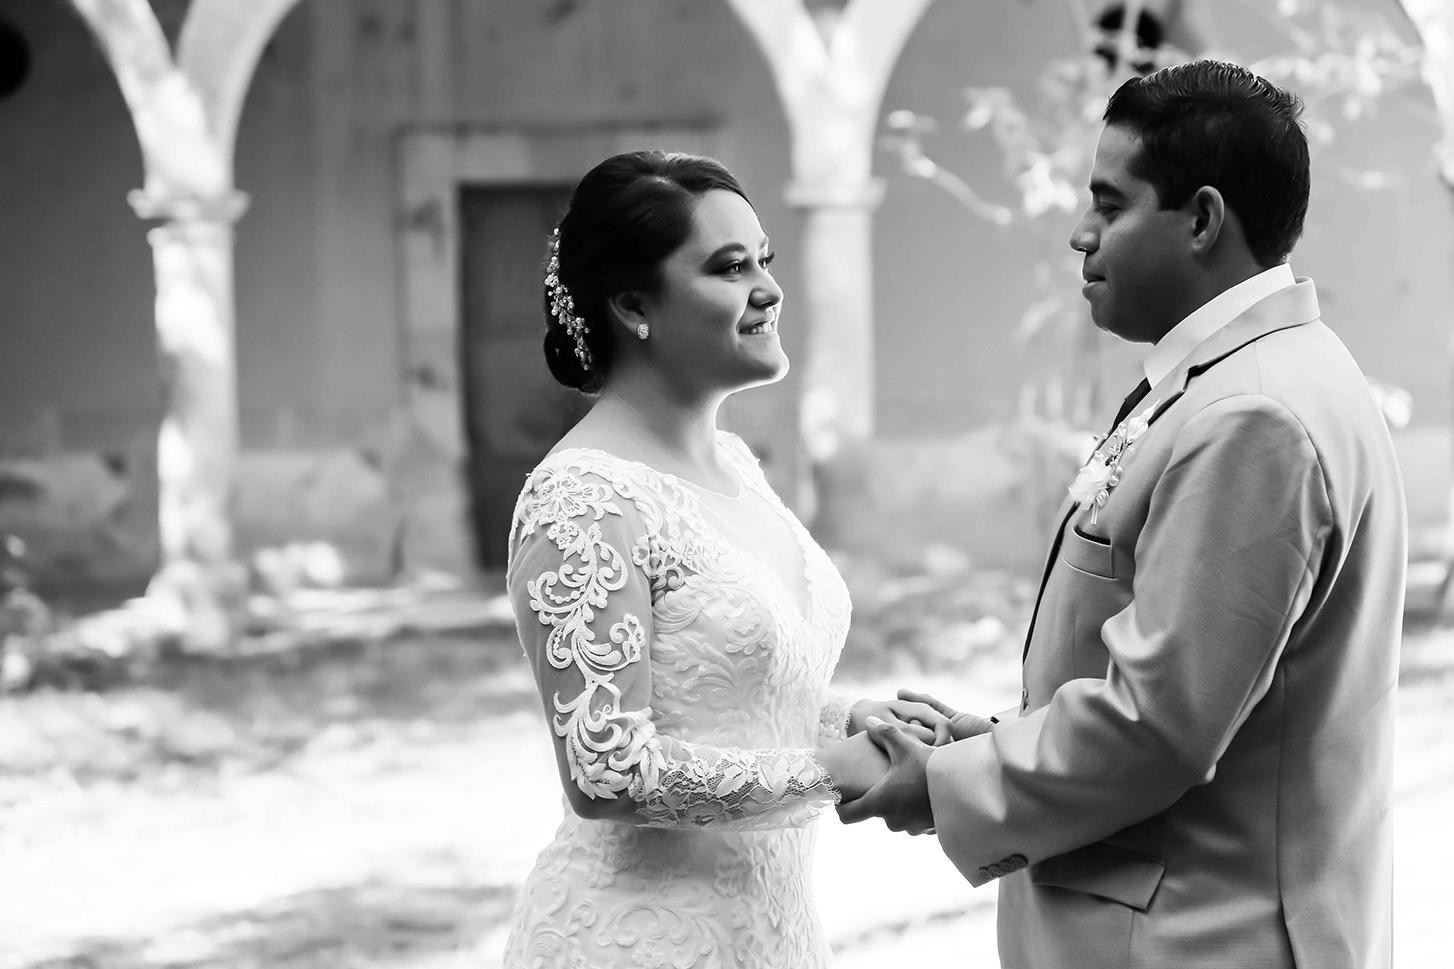 Maroge-Angela-Velazquez-fotografia-boda-15